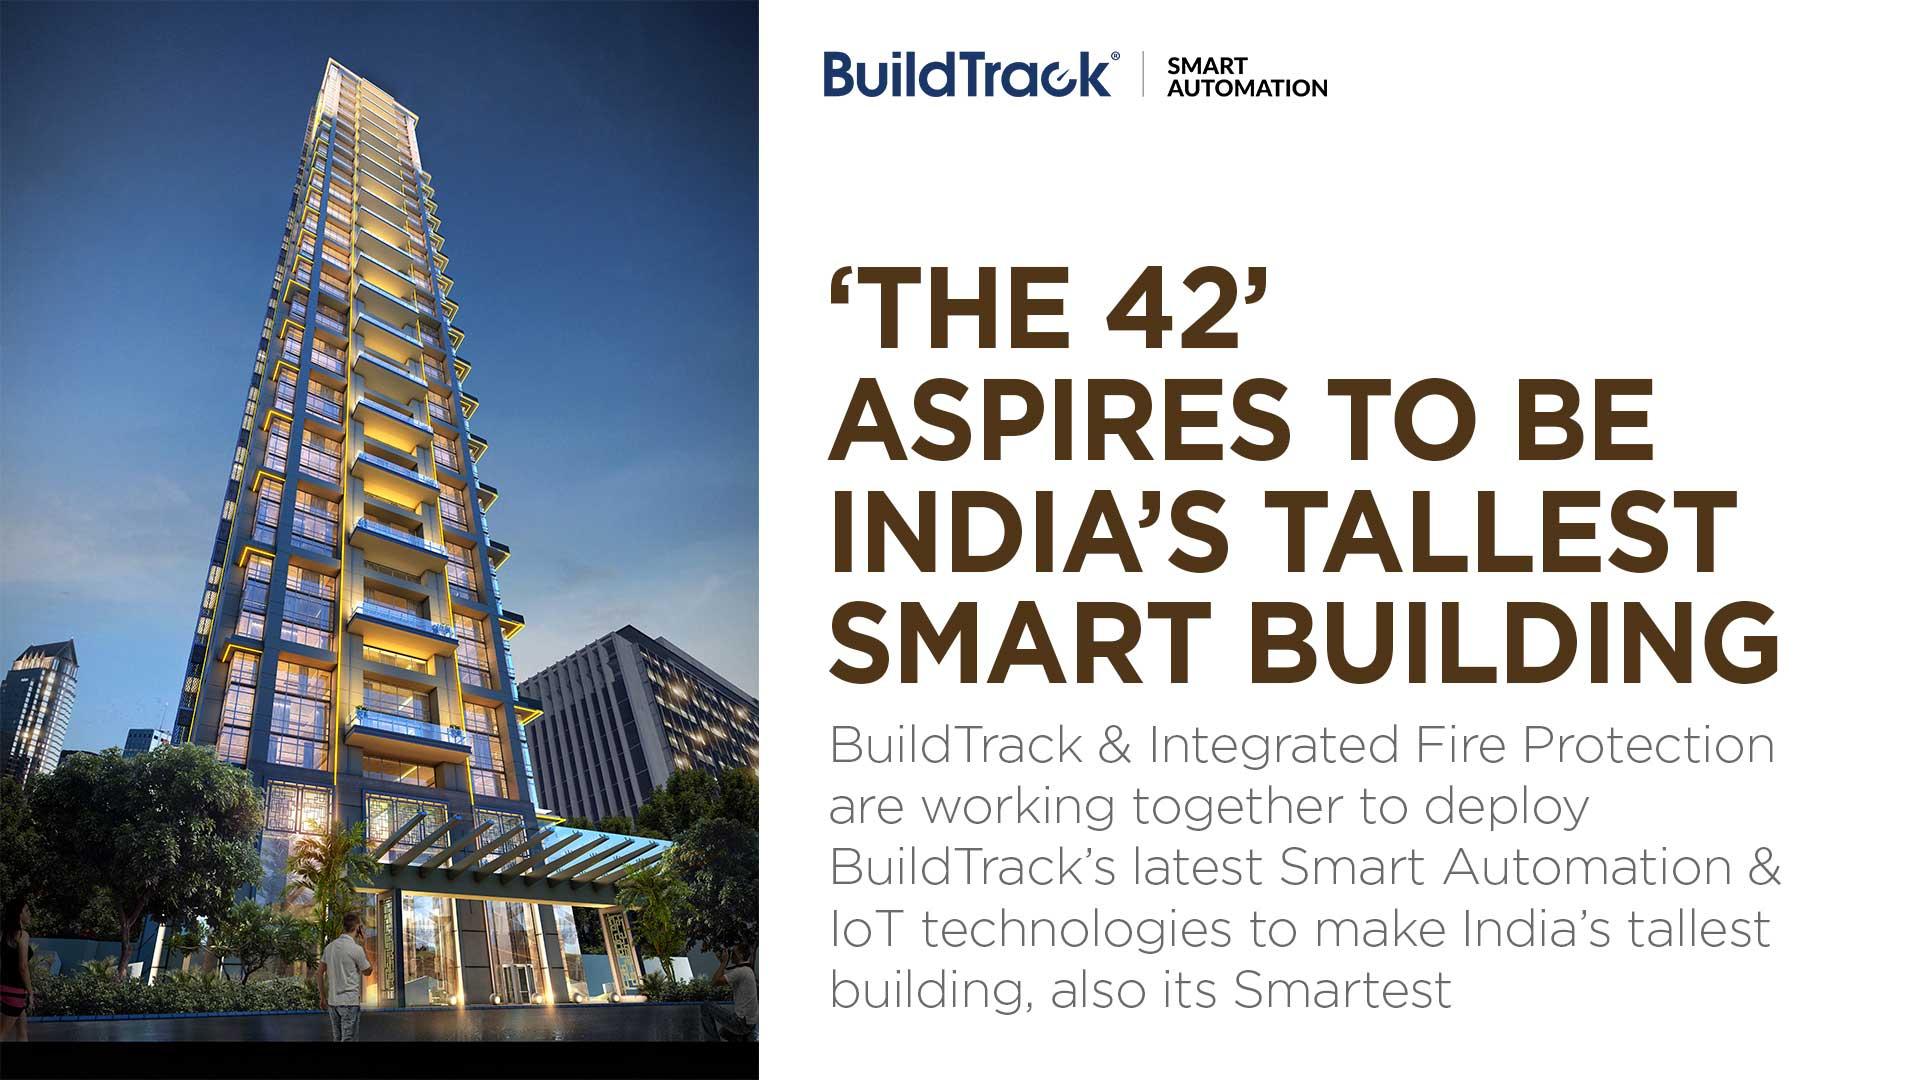 BuildTrack's Building Management System